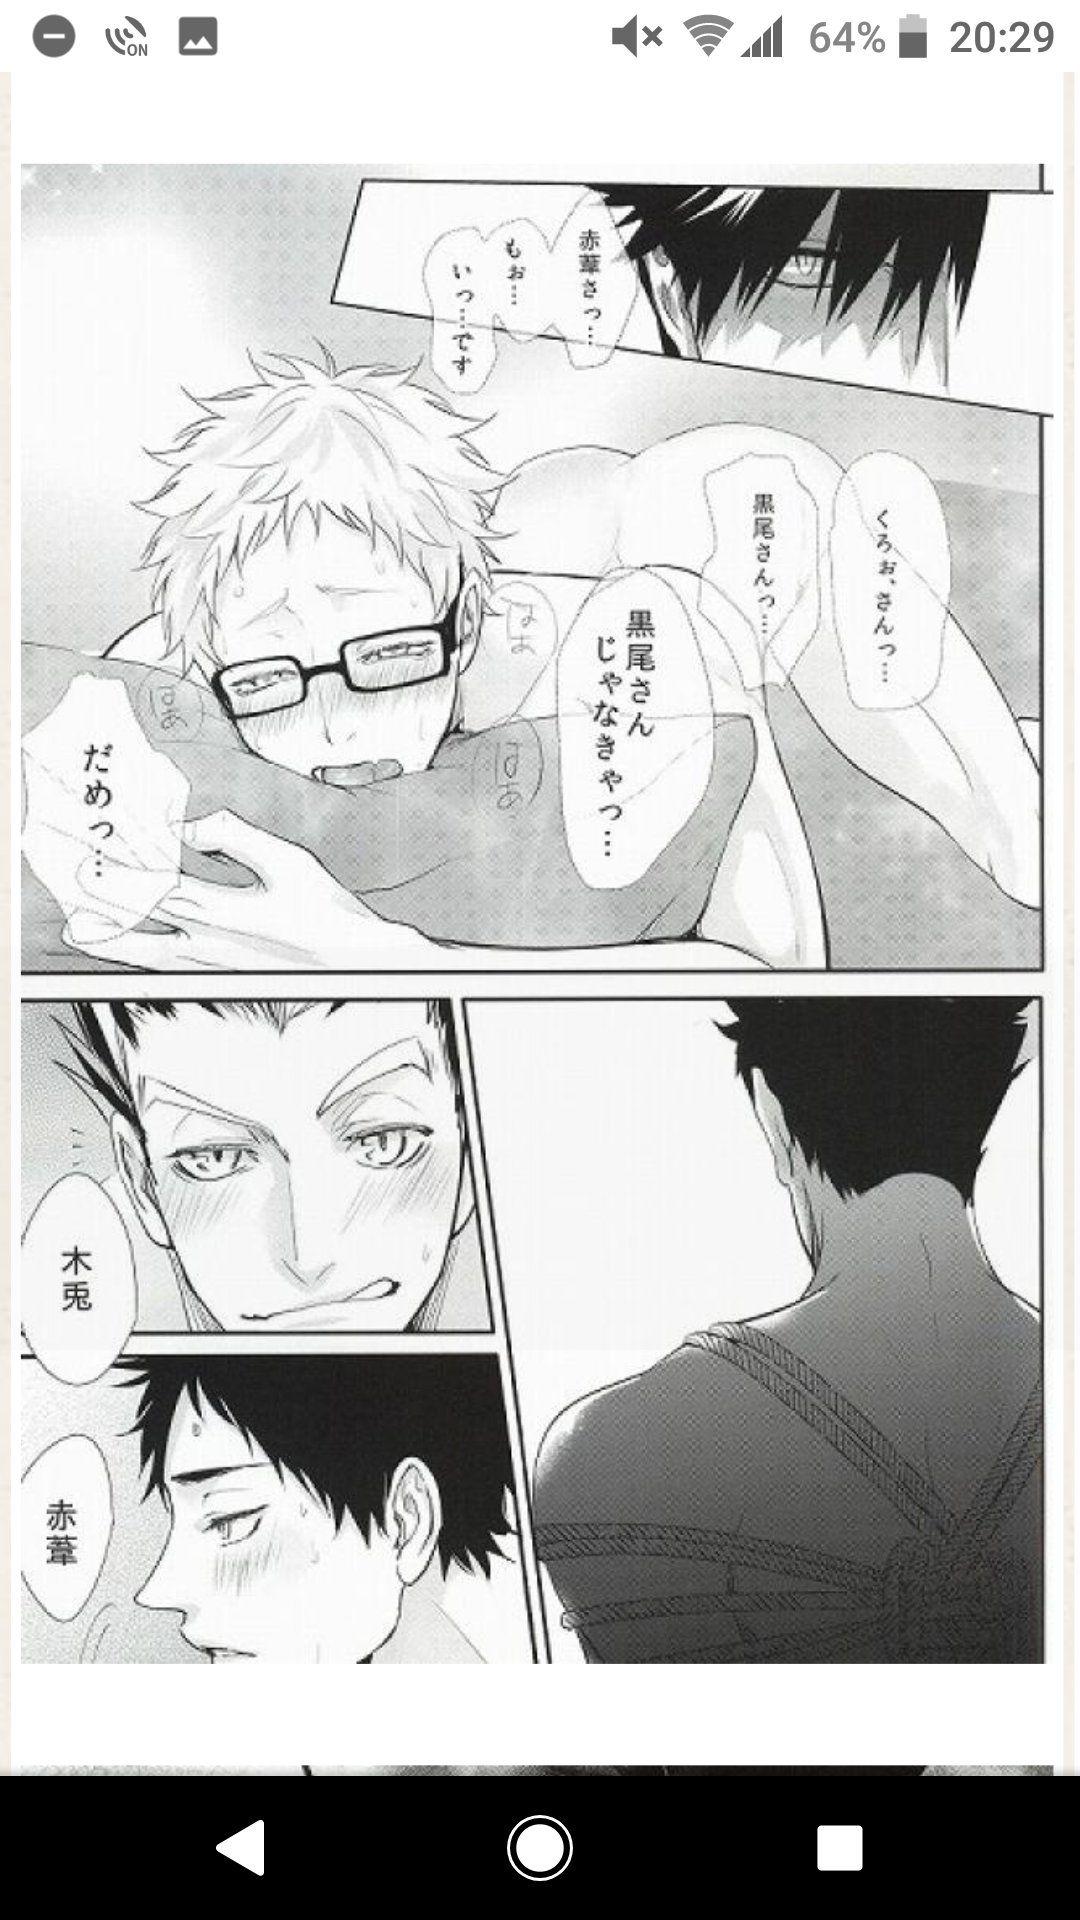 Bl 松花 ハイキュー 小説